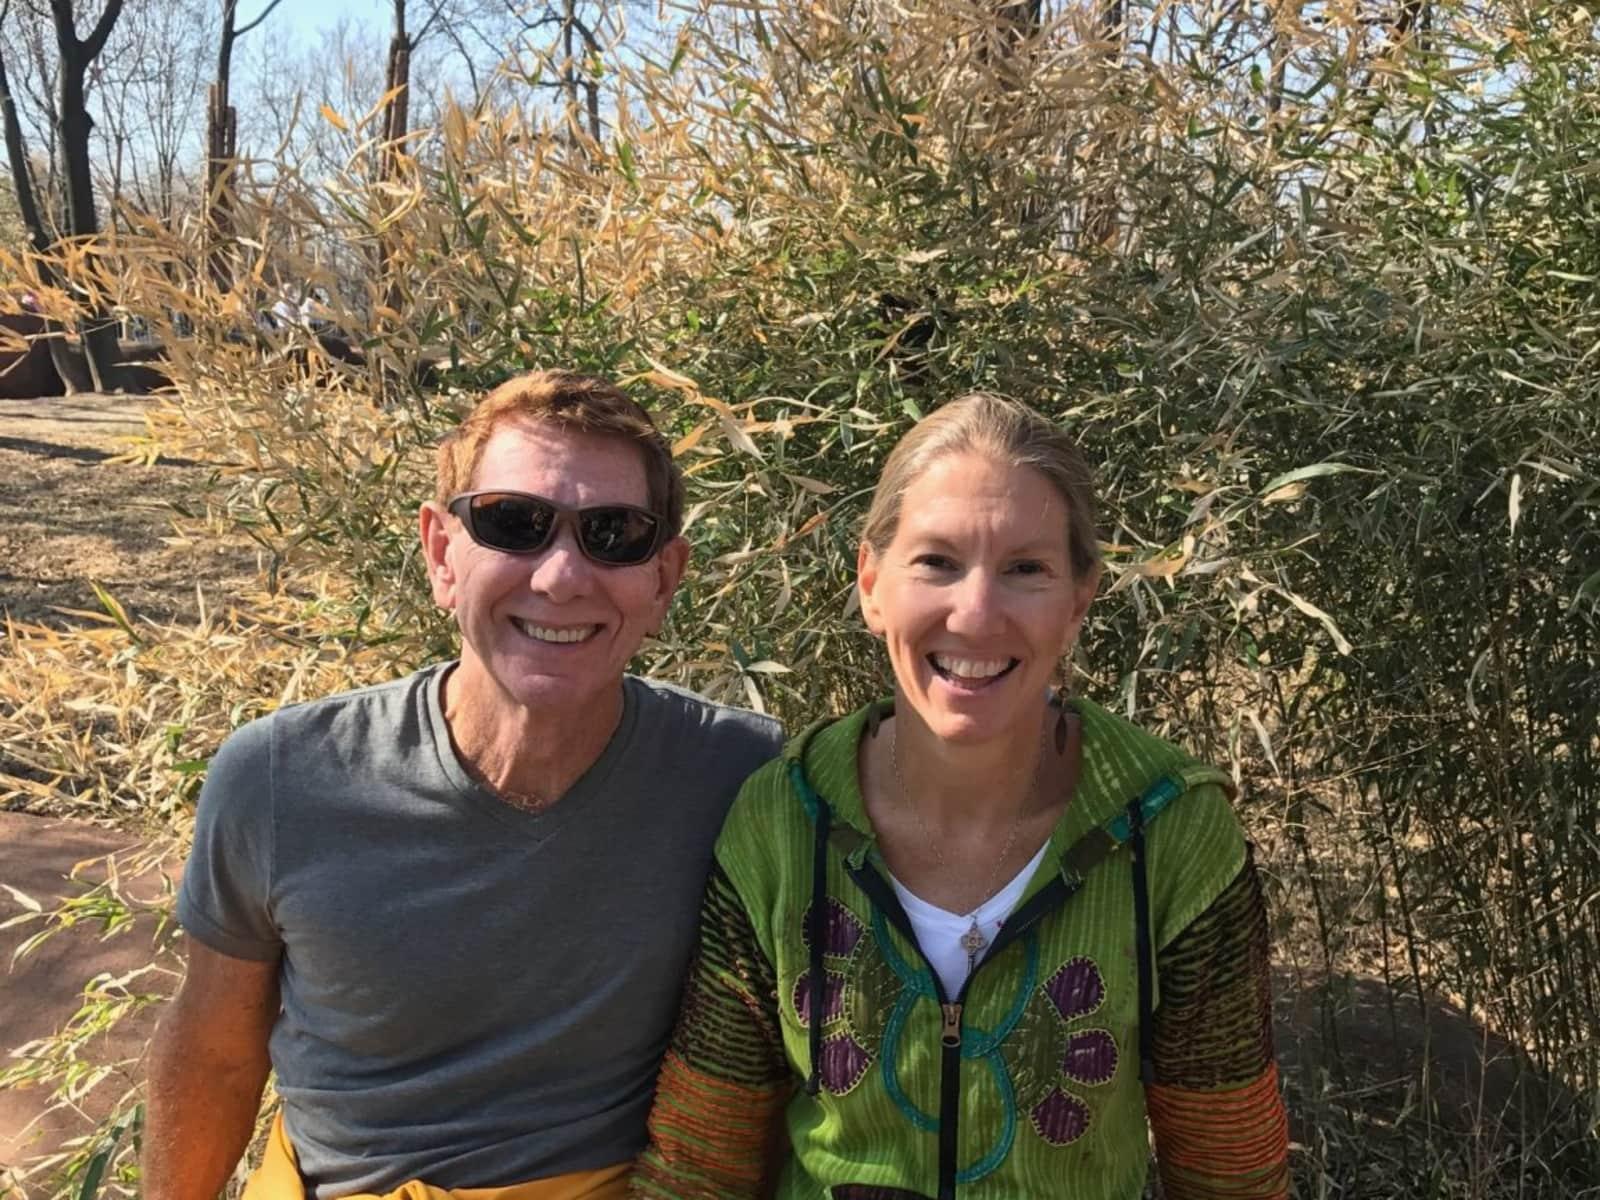 William & Marie from Valparaiso, Indiana, United States